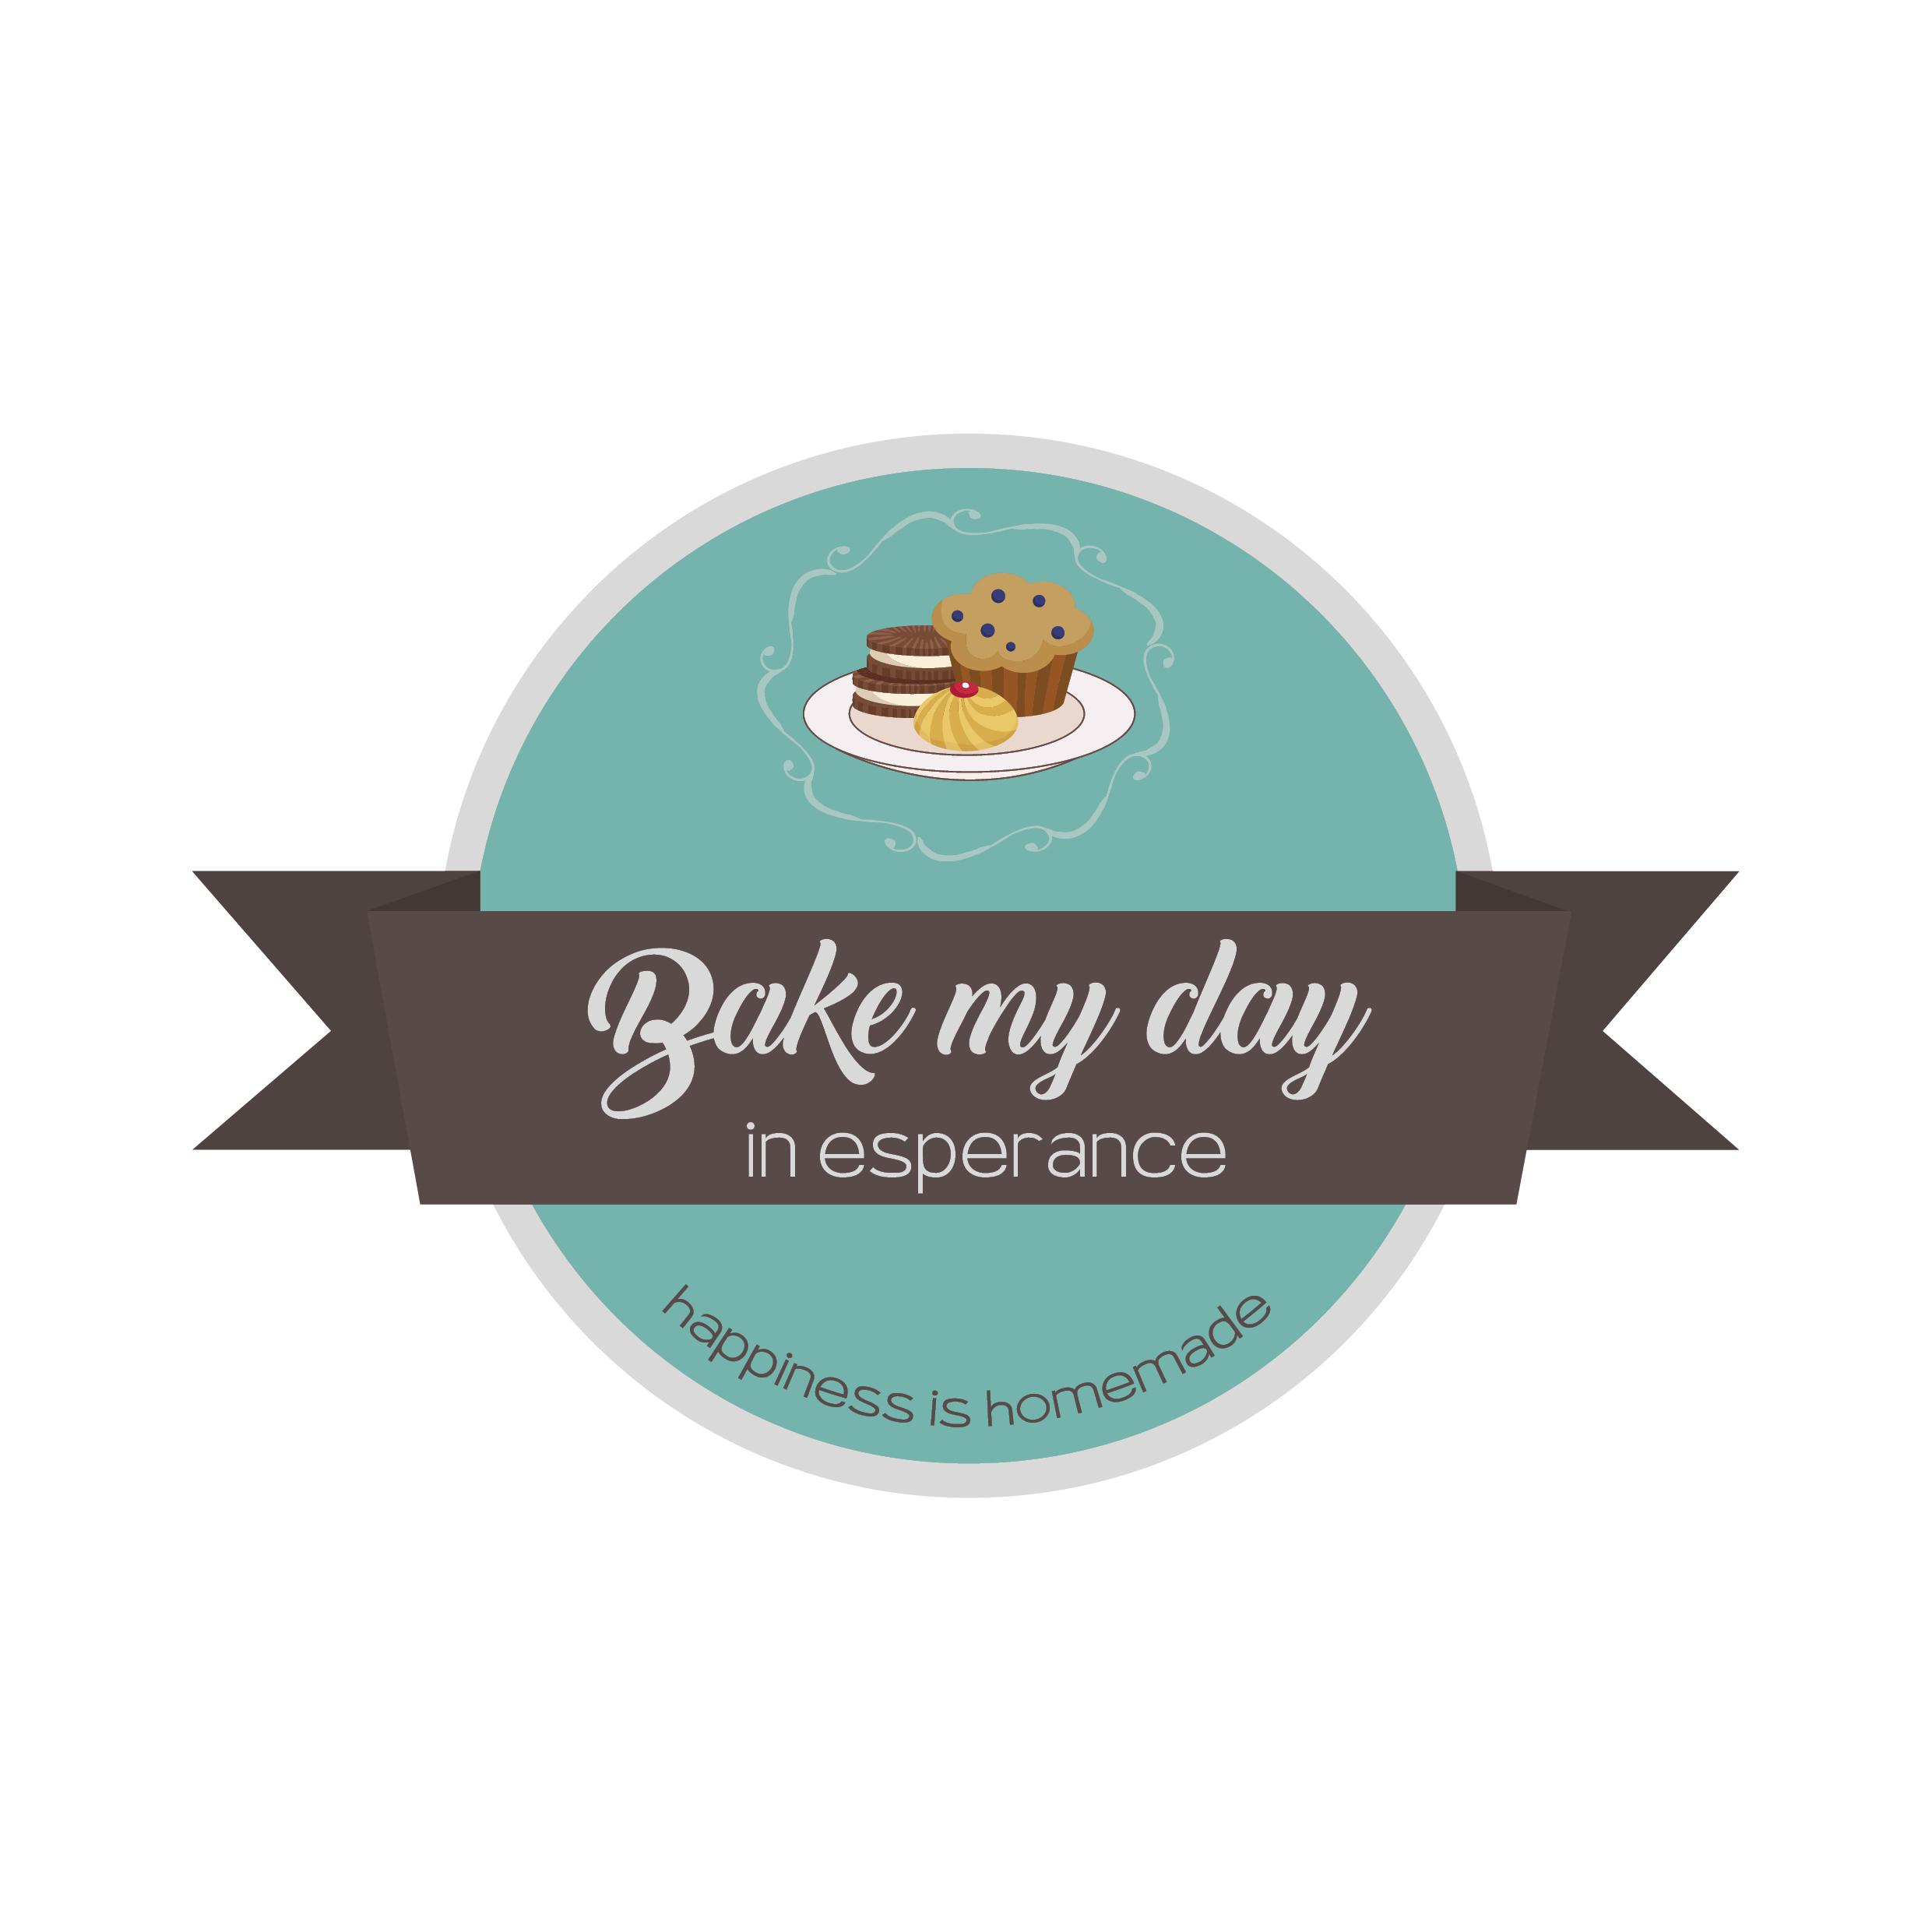 Bake my day logo.jpg